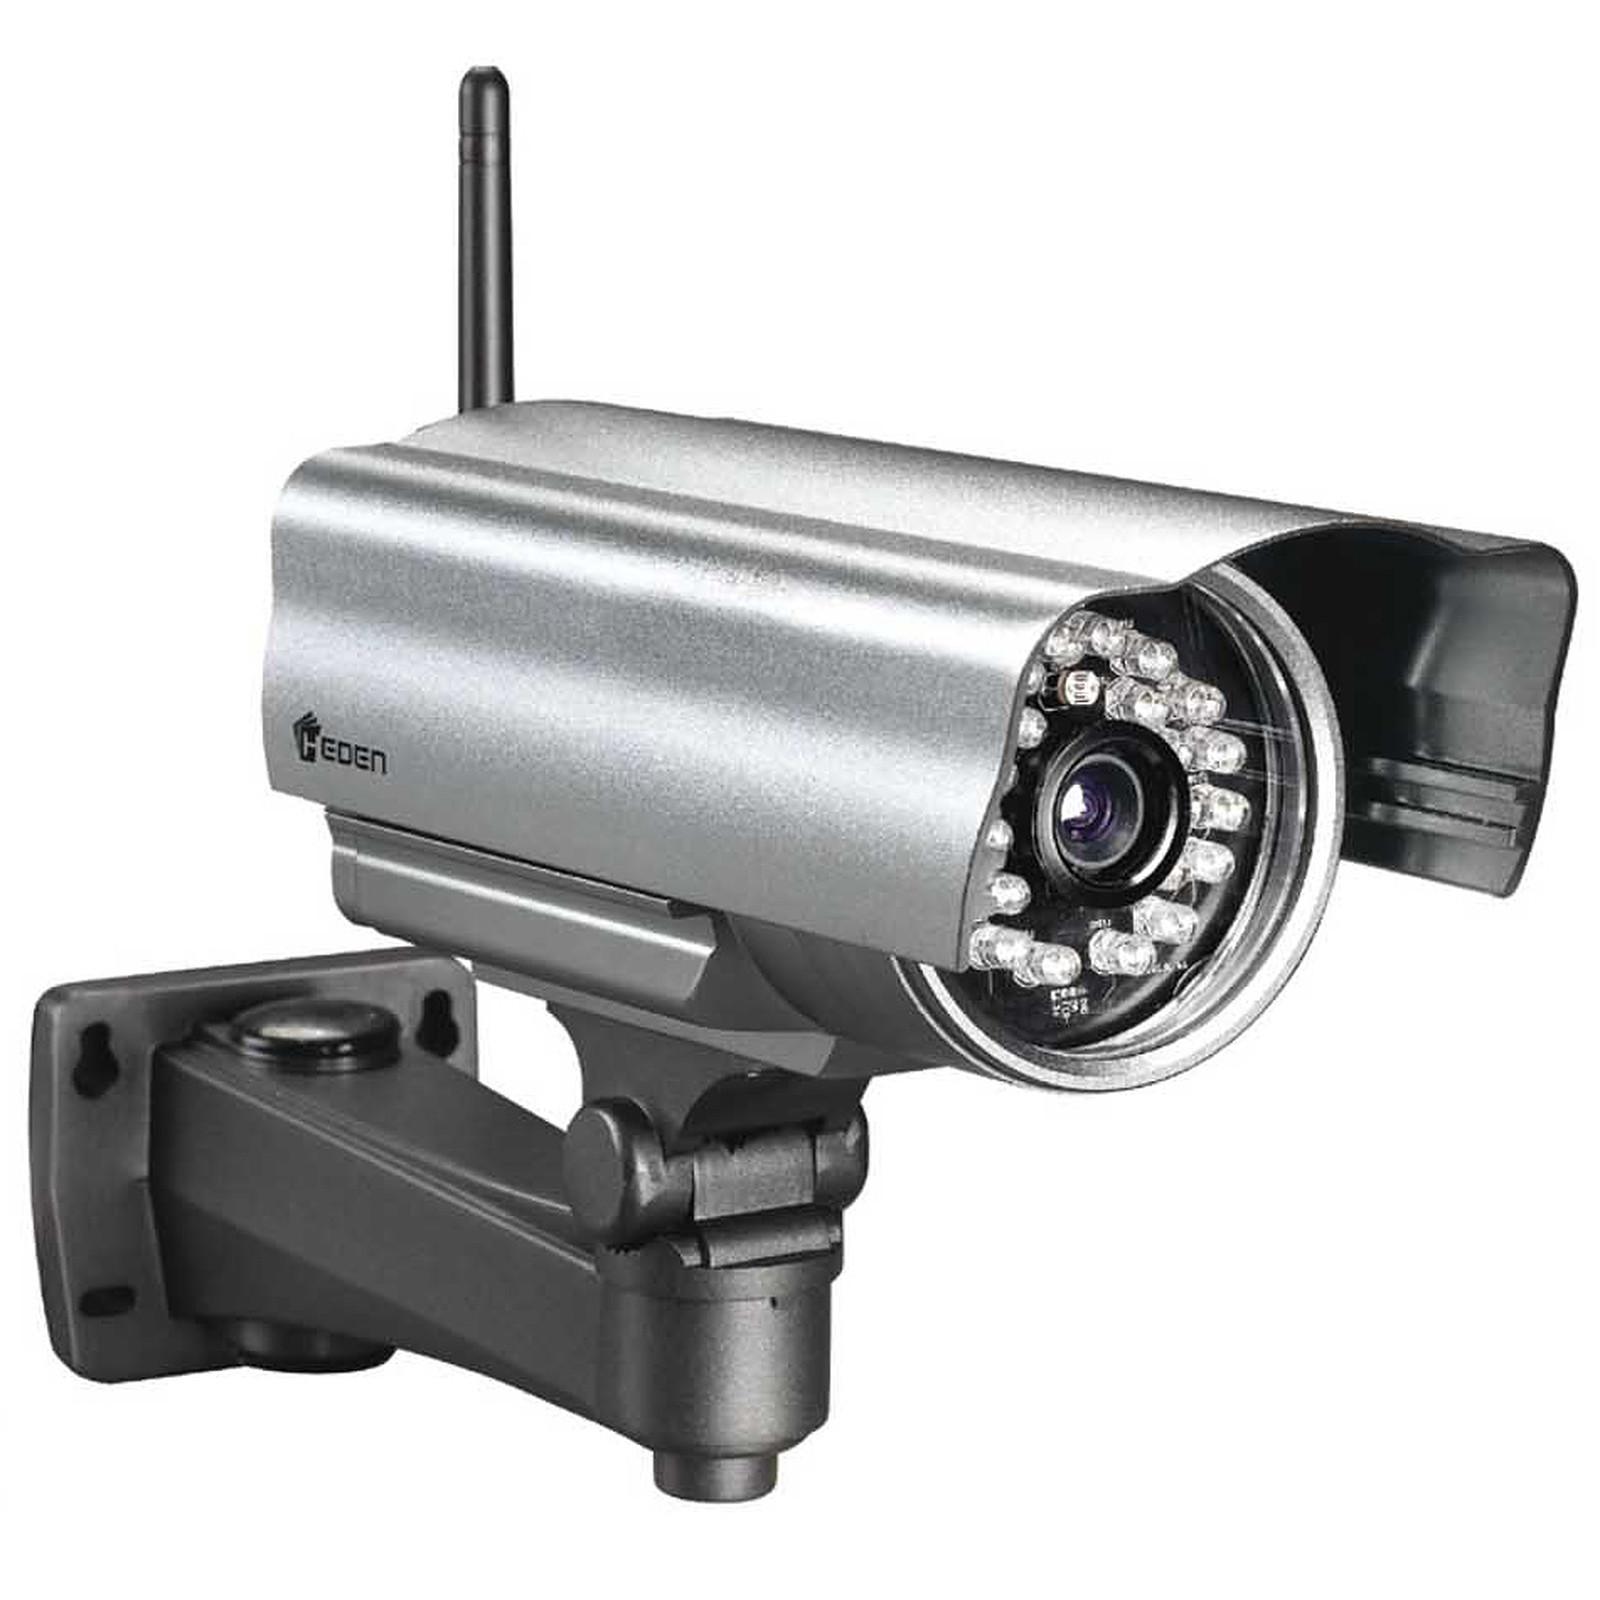 29c3d9f67ca0b Heden VisionCam Cloud V3.4 - Caméra IP Heden sur LDLC.com